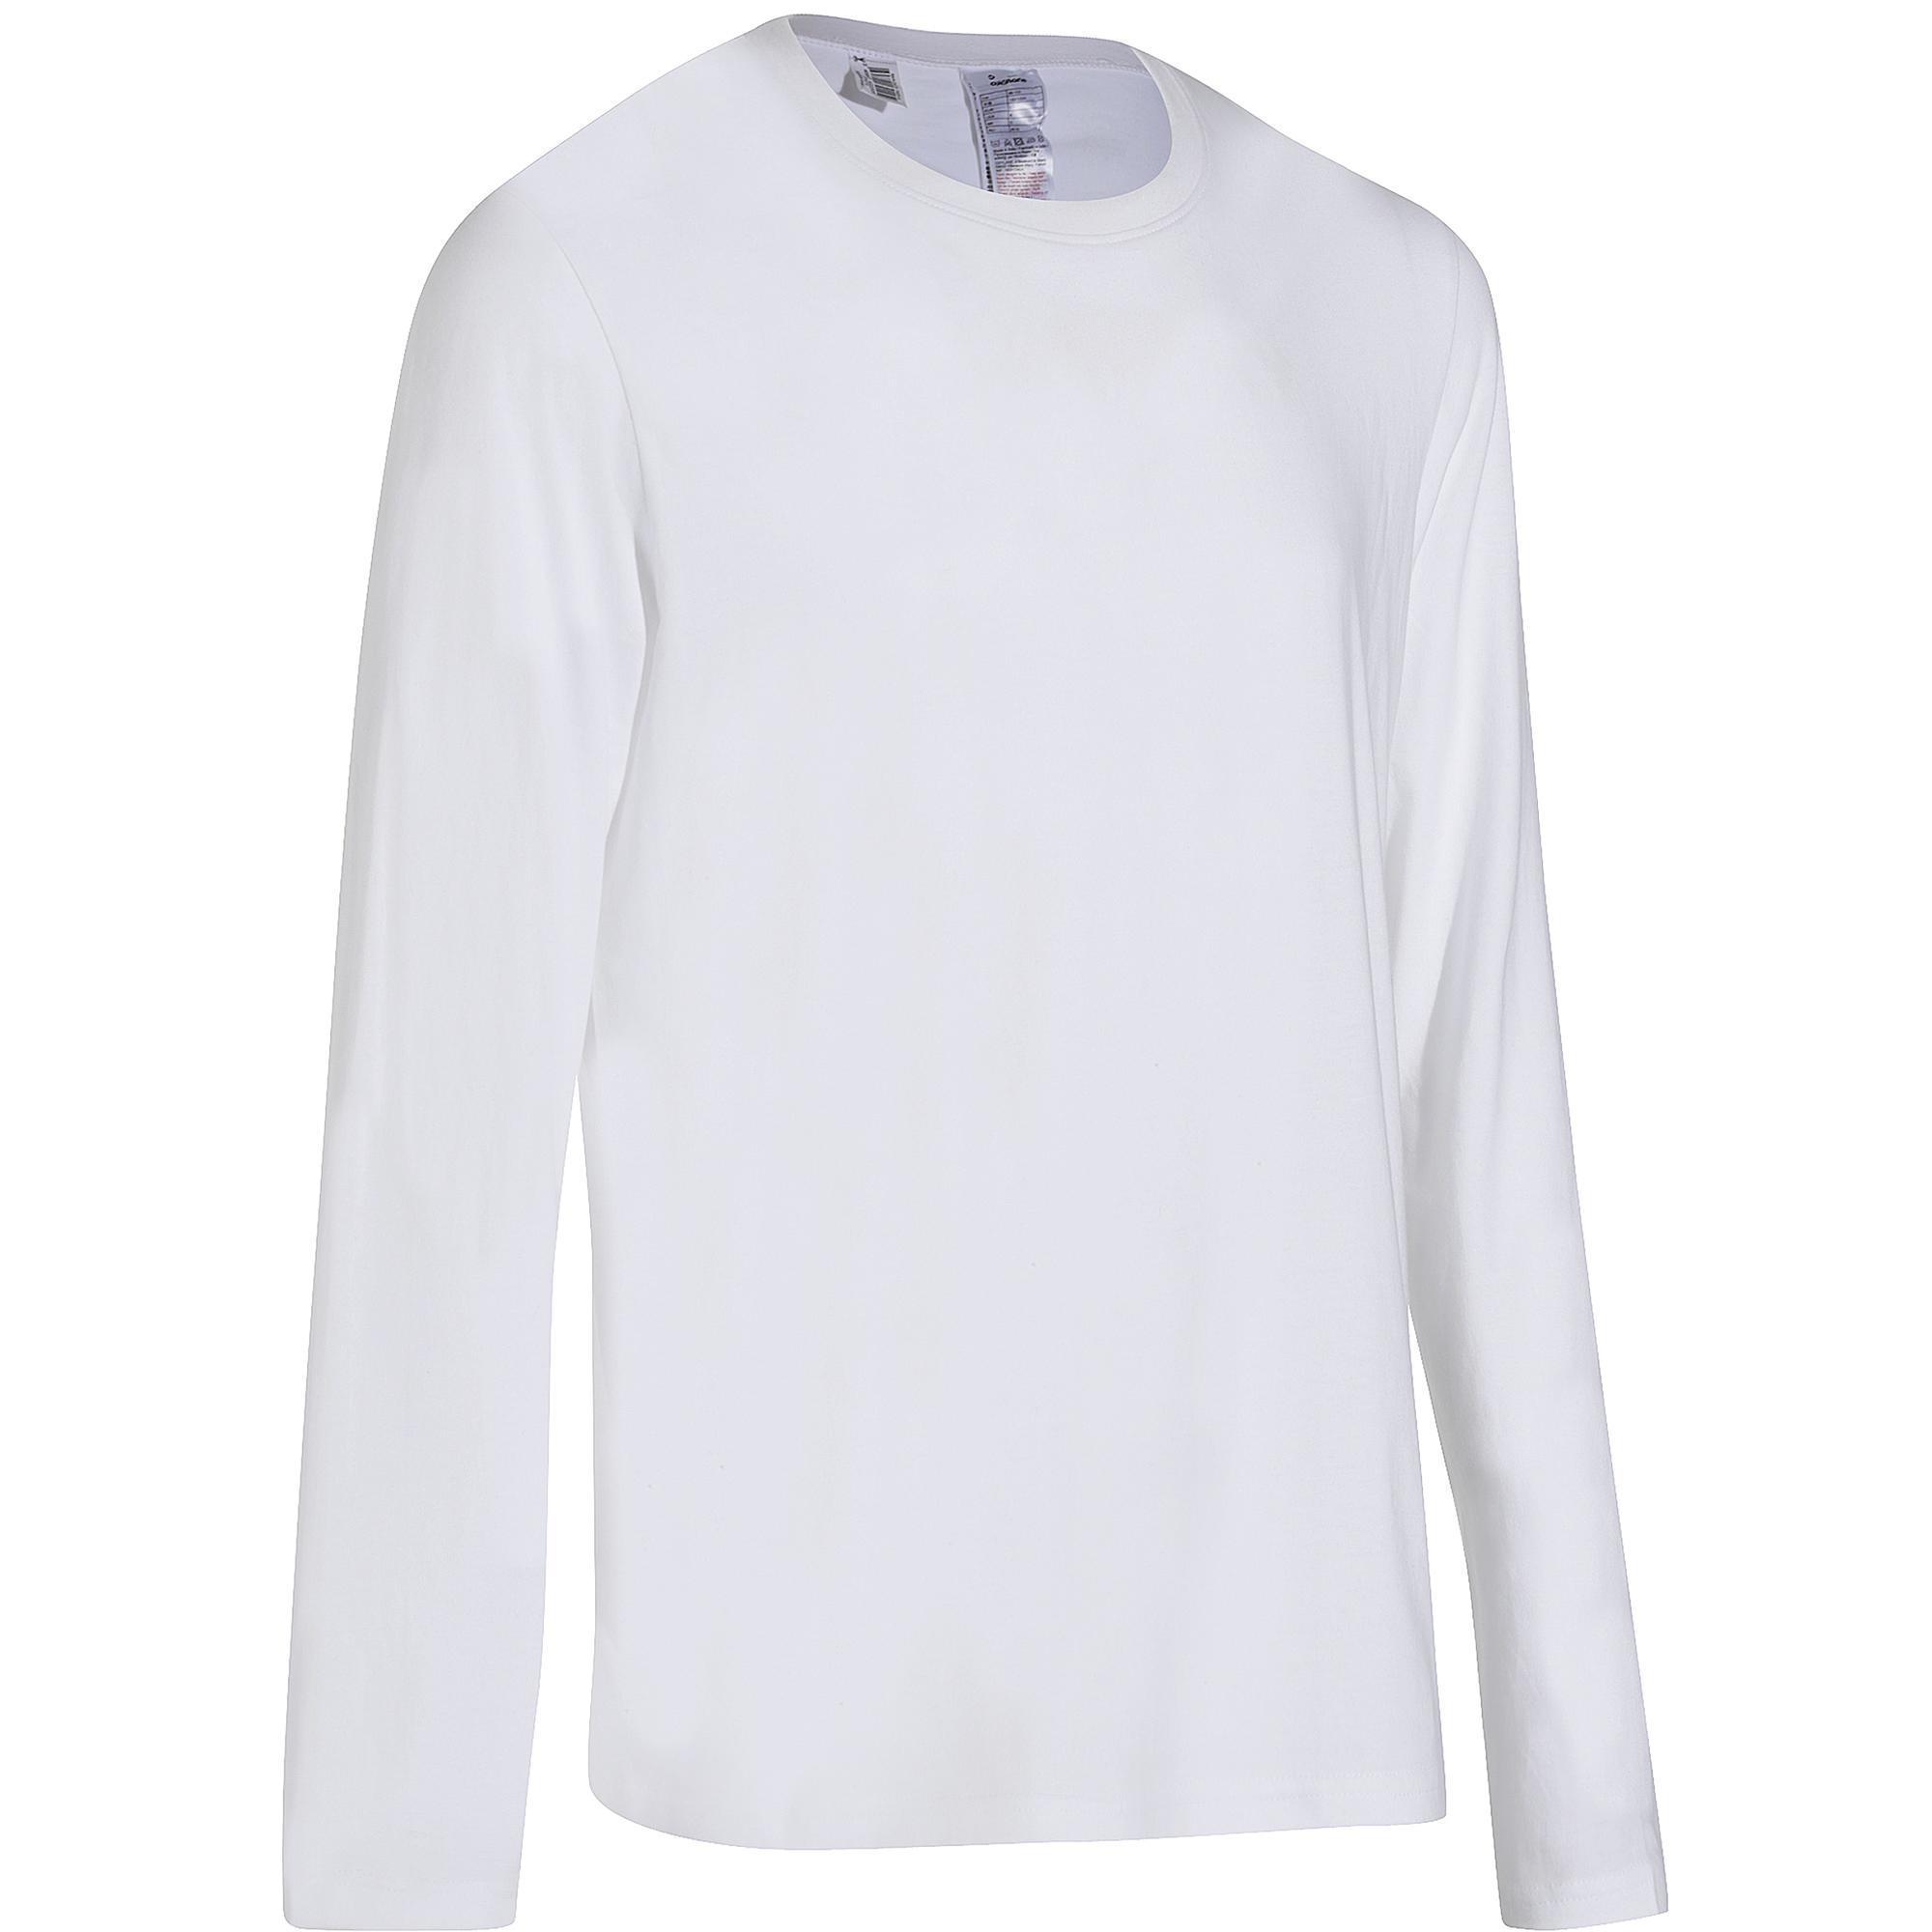 T shirt homme 100 manches longues blanc domyos